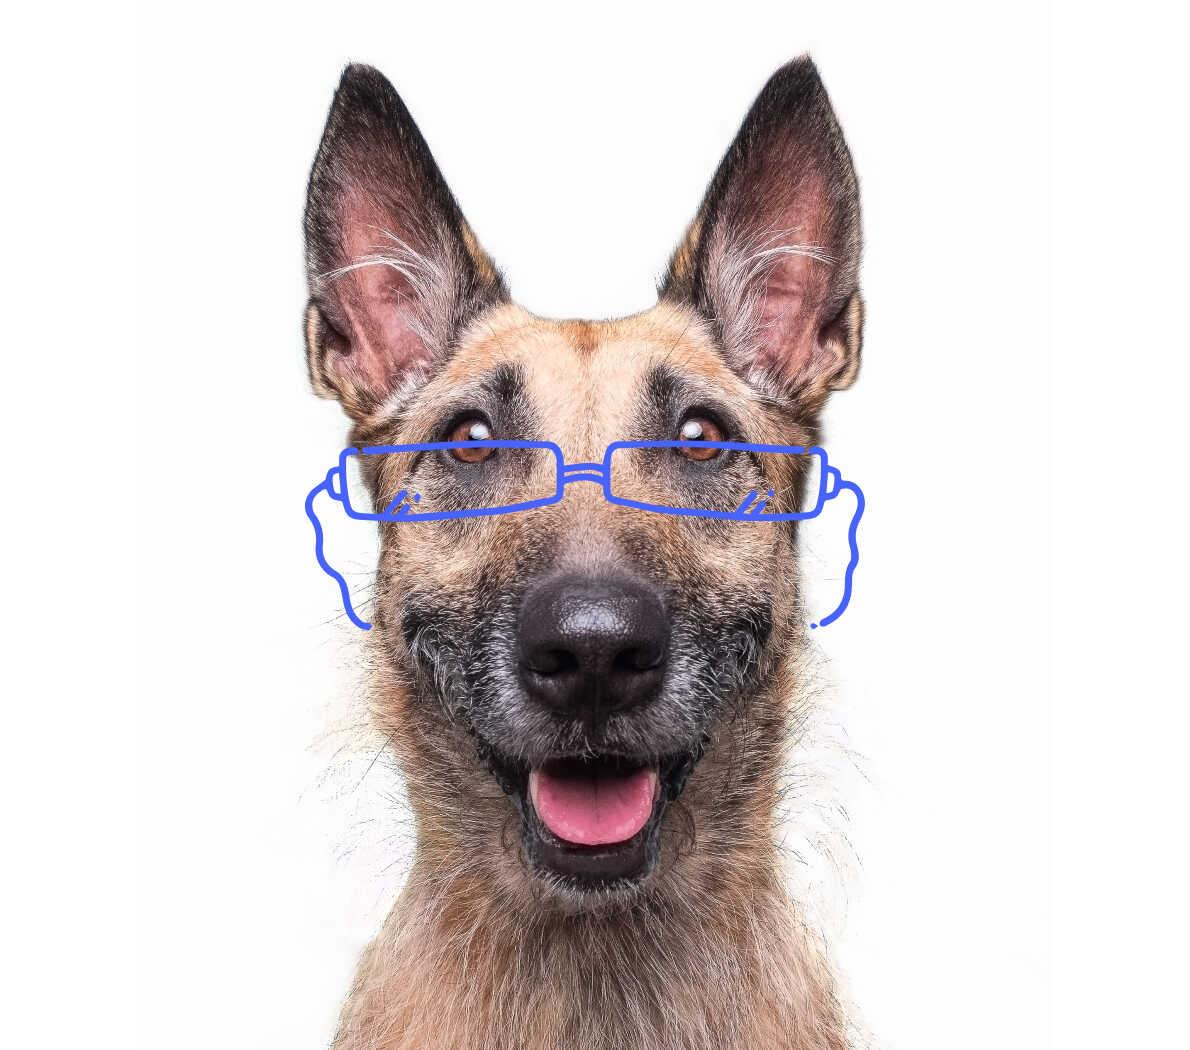 Happy elderly dog with glasses